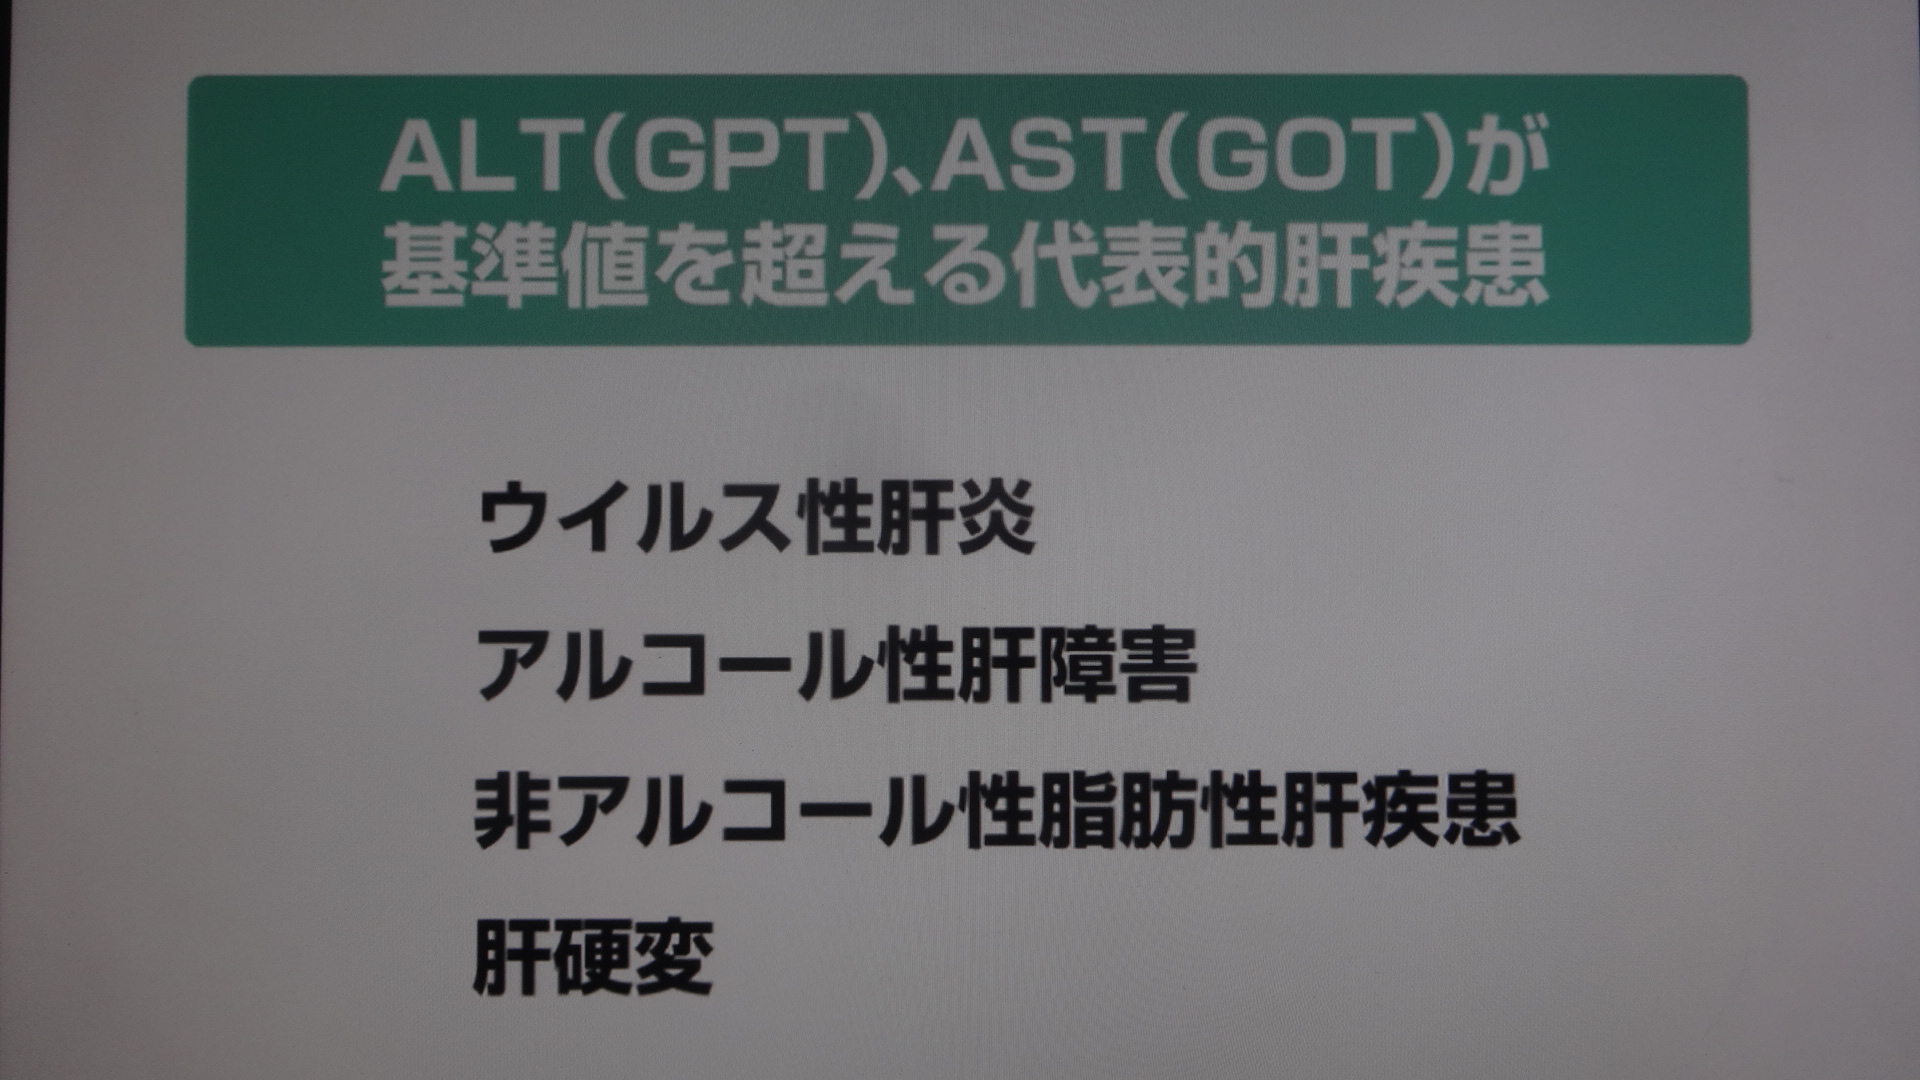 AST ALTが異常値を示す疾患のまとめ